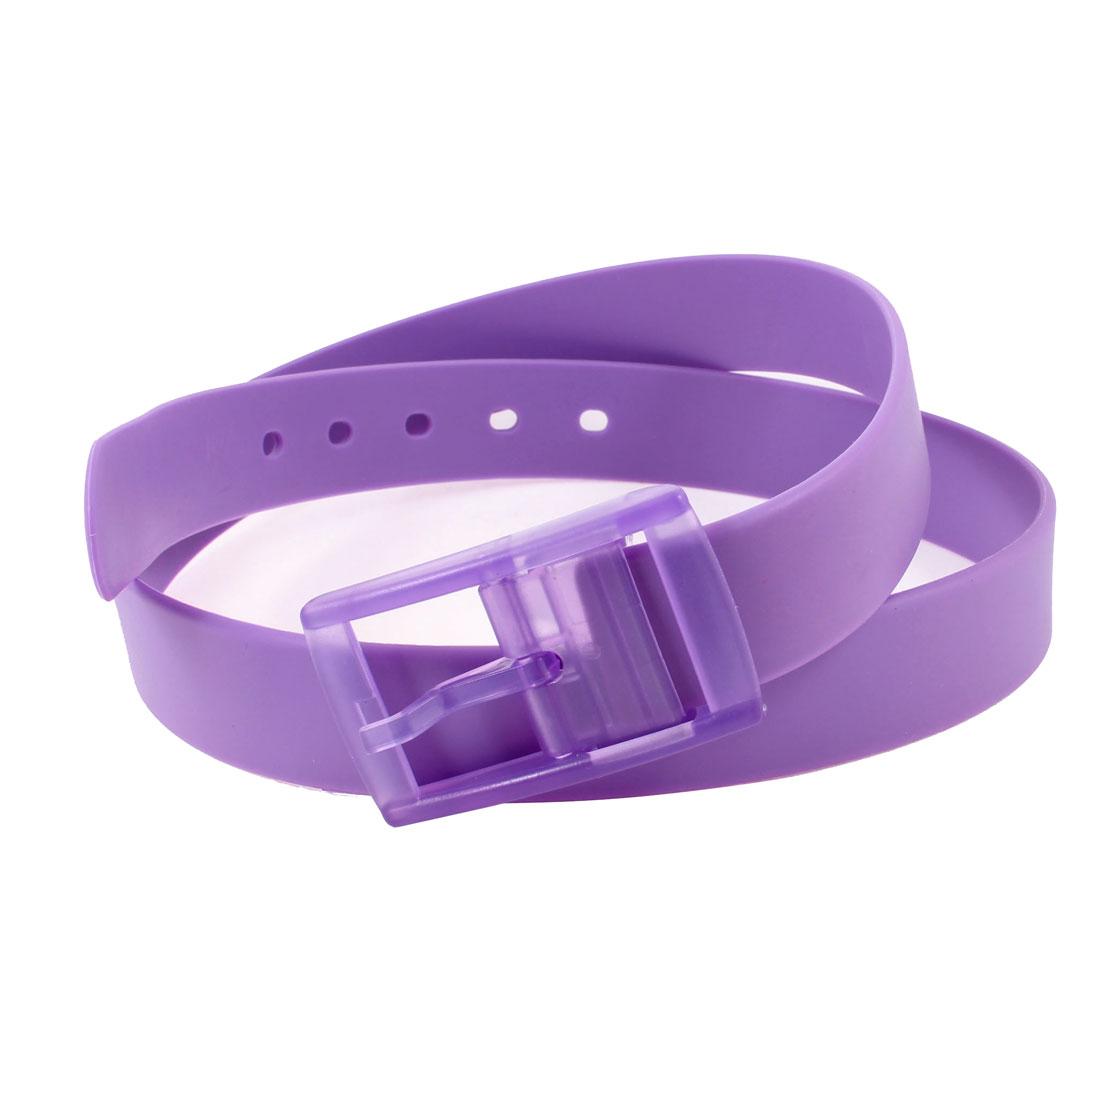 Jelly Purple 5 Hole Adjustable Single Pin Buckle Waist Belt Band for Women Man